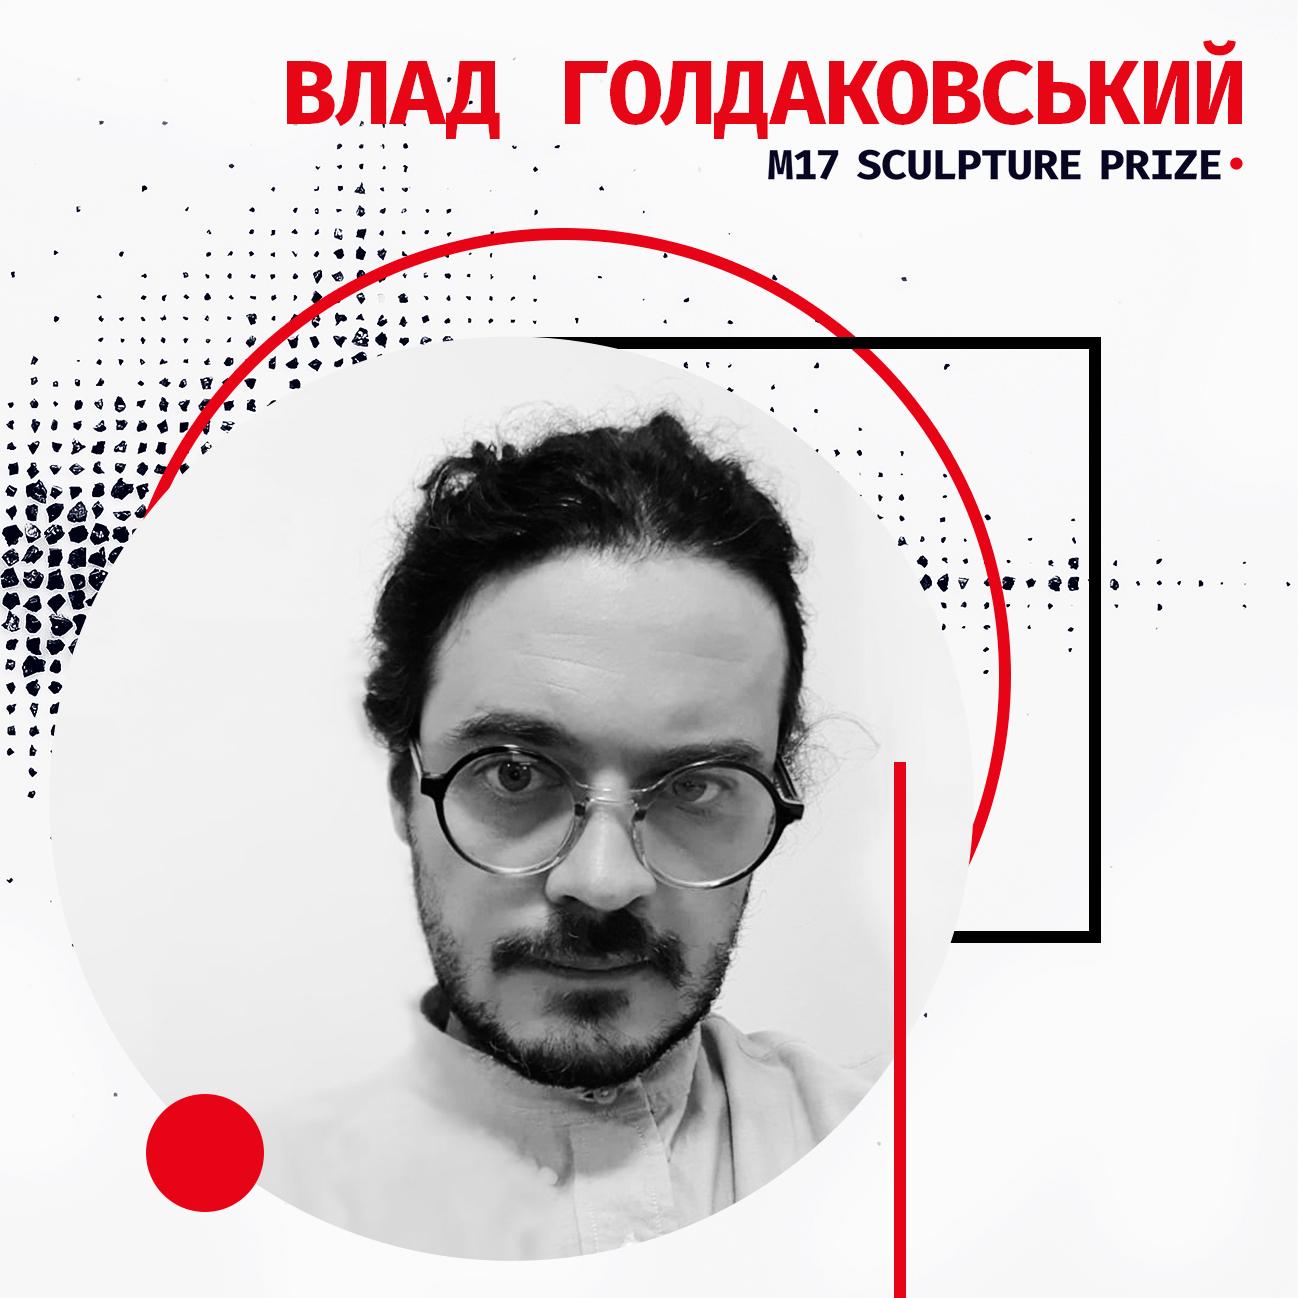 Nominees for the M17 Sculpture Prize: Vlad Goldakovskiy (Kyiv)